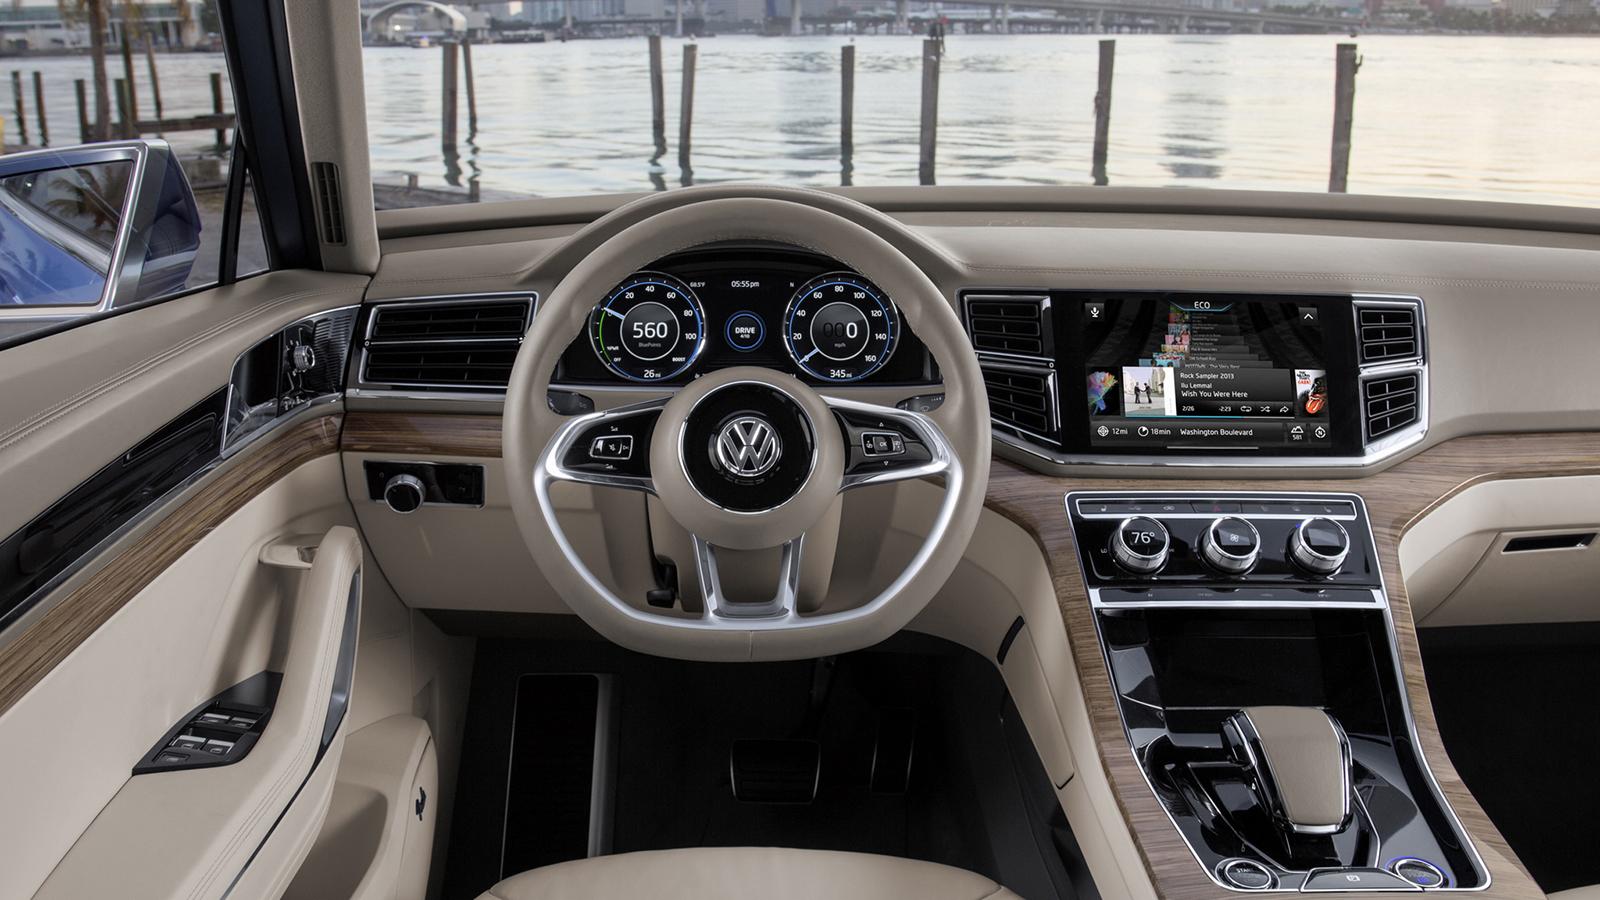 Volkswagen Teramont семиместный кроссовер Мир авто мото